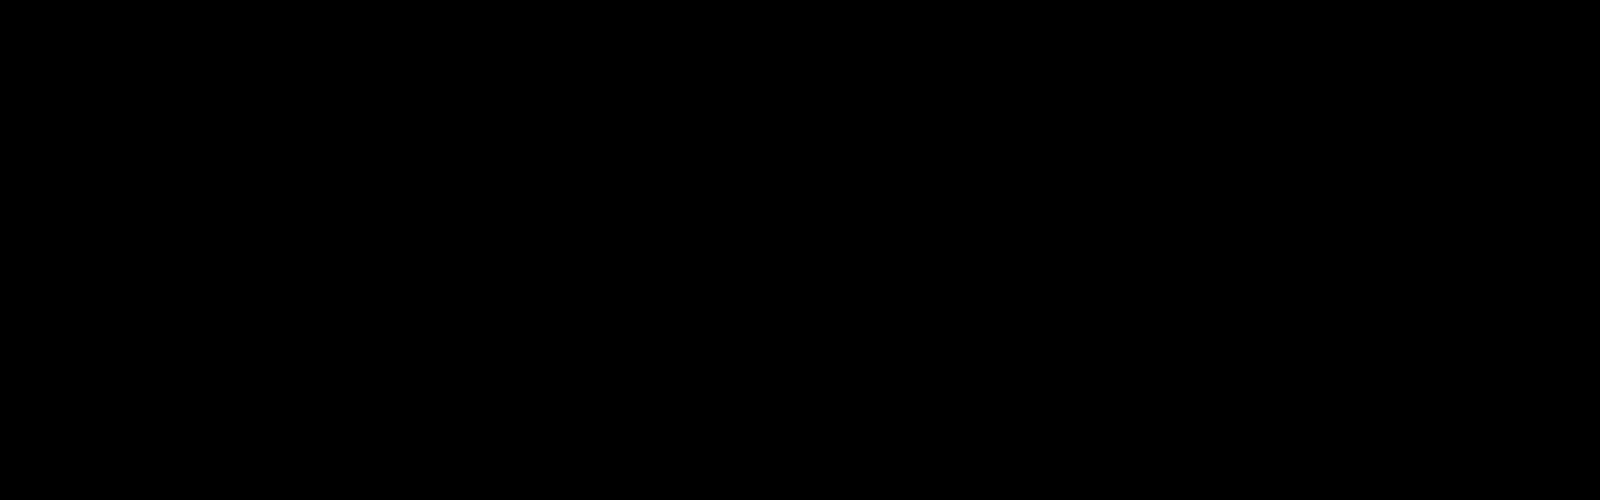 Subdial Helpdesk